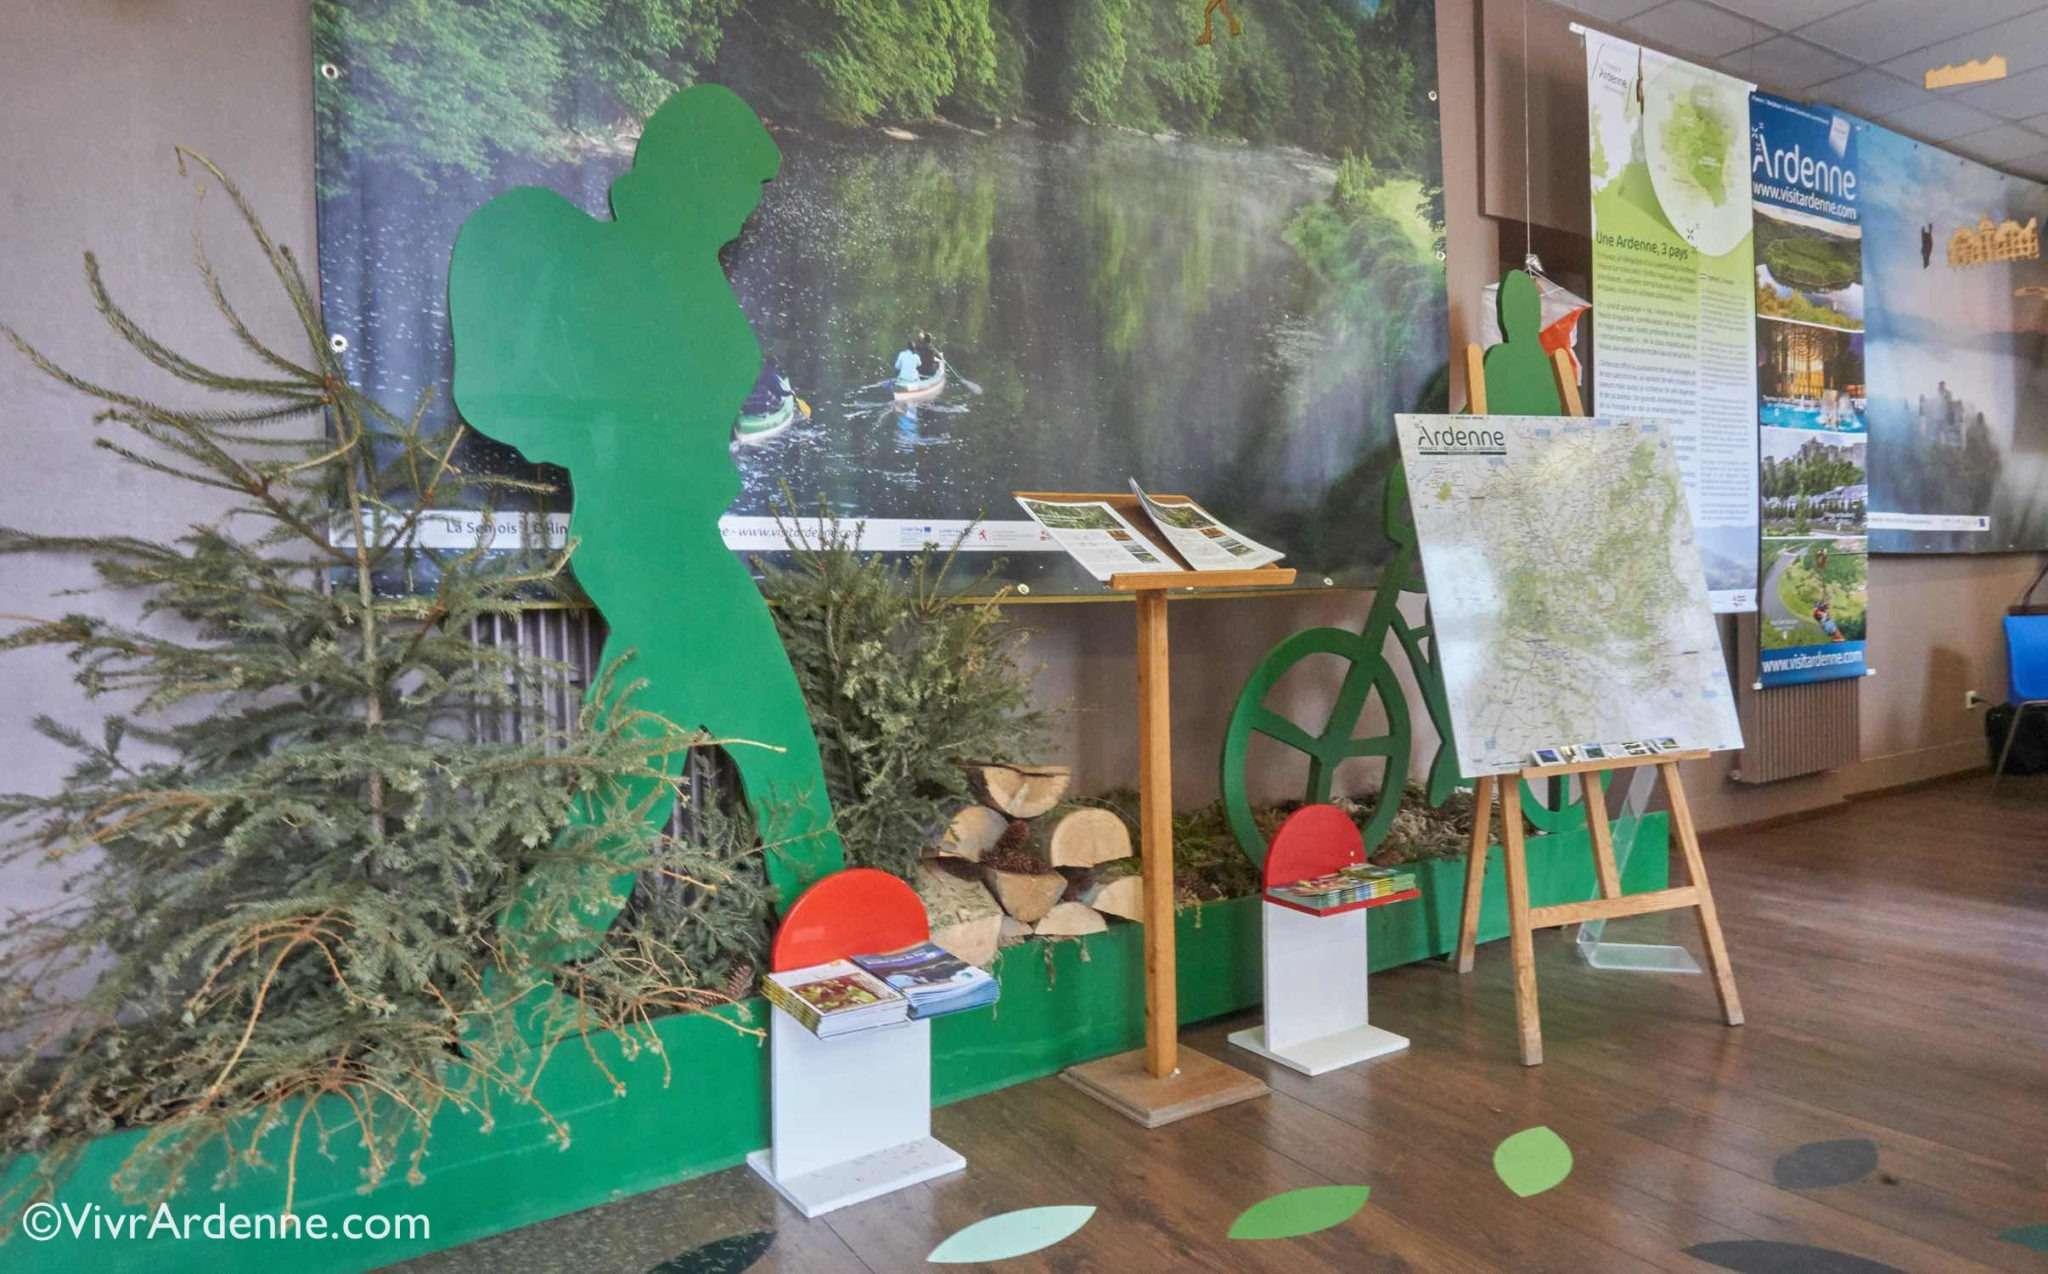 VivrArdenne - Exposition sur l'Ardenne